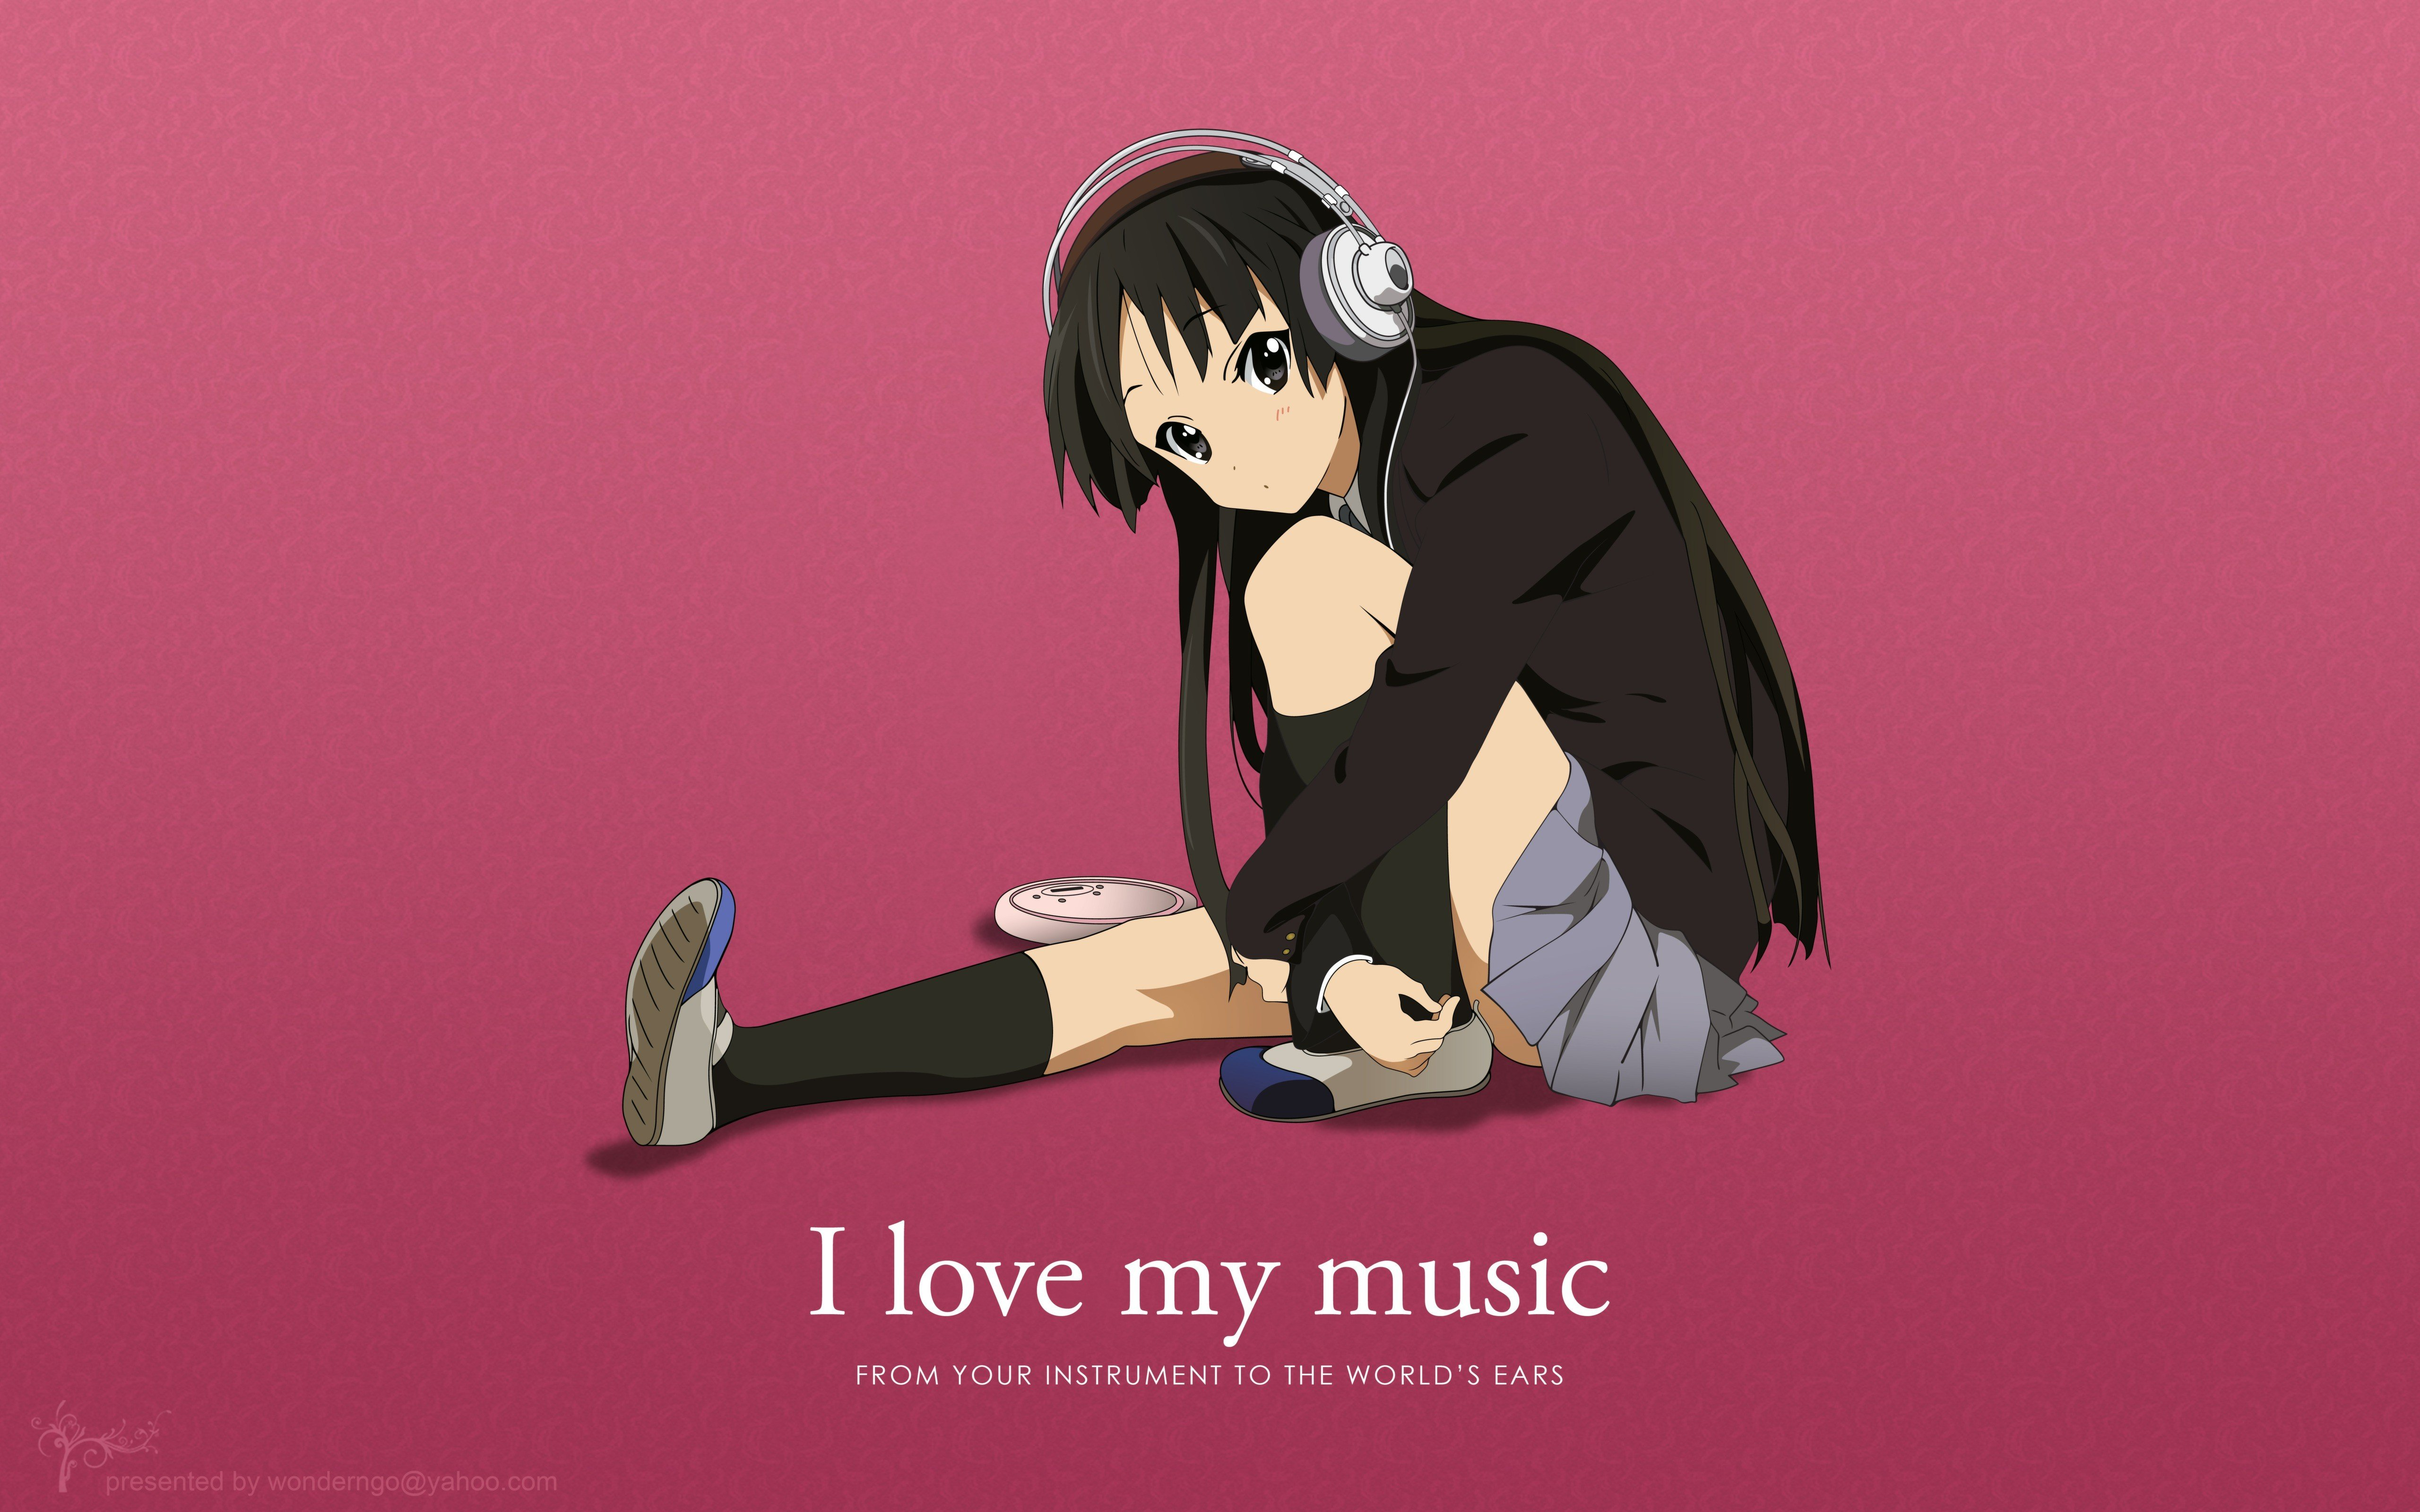 anime music images k - photo #20